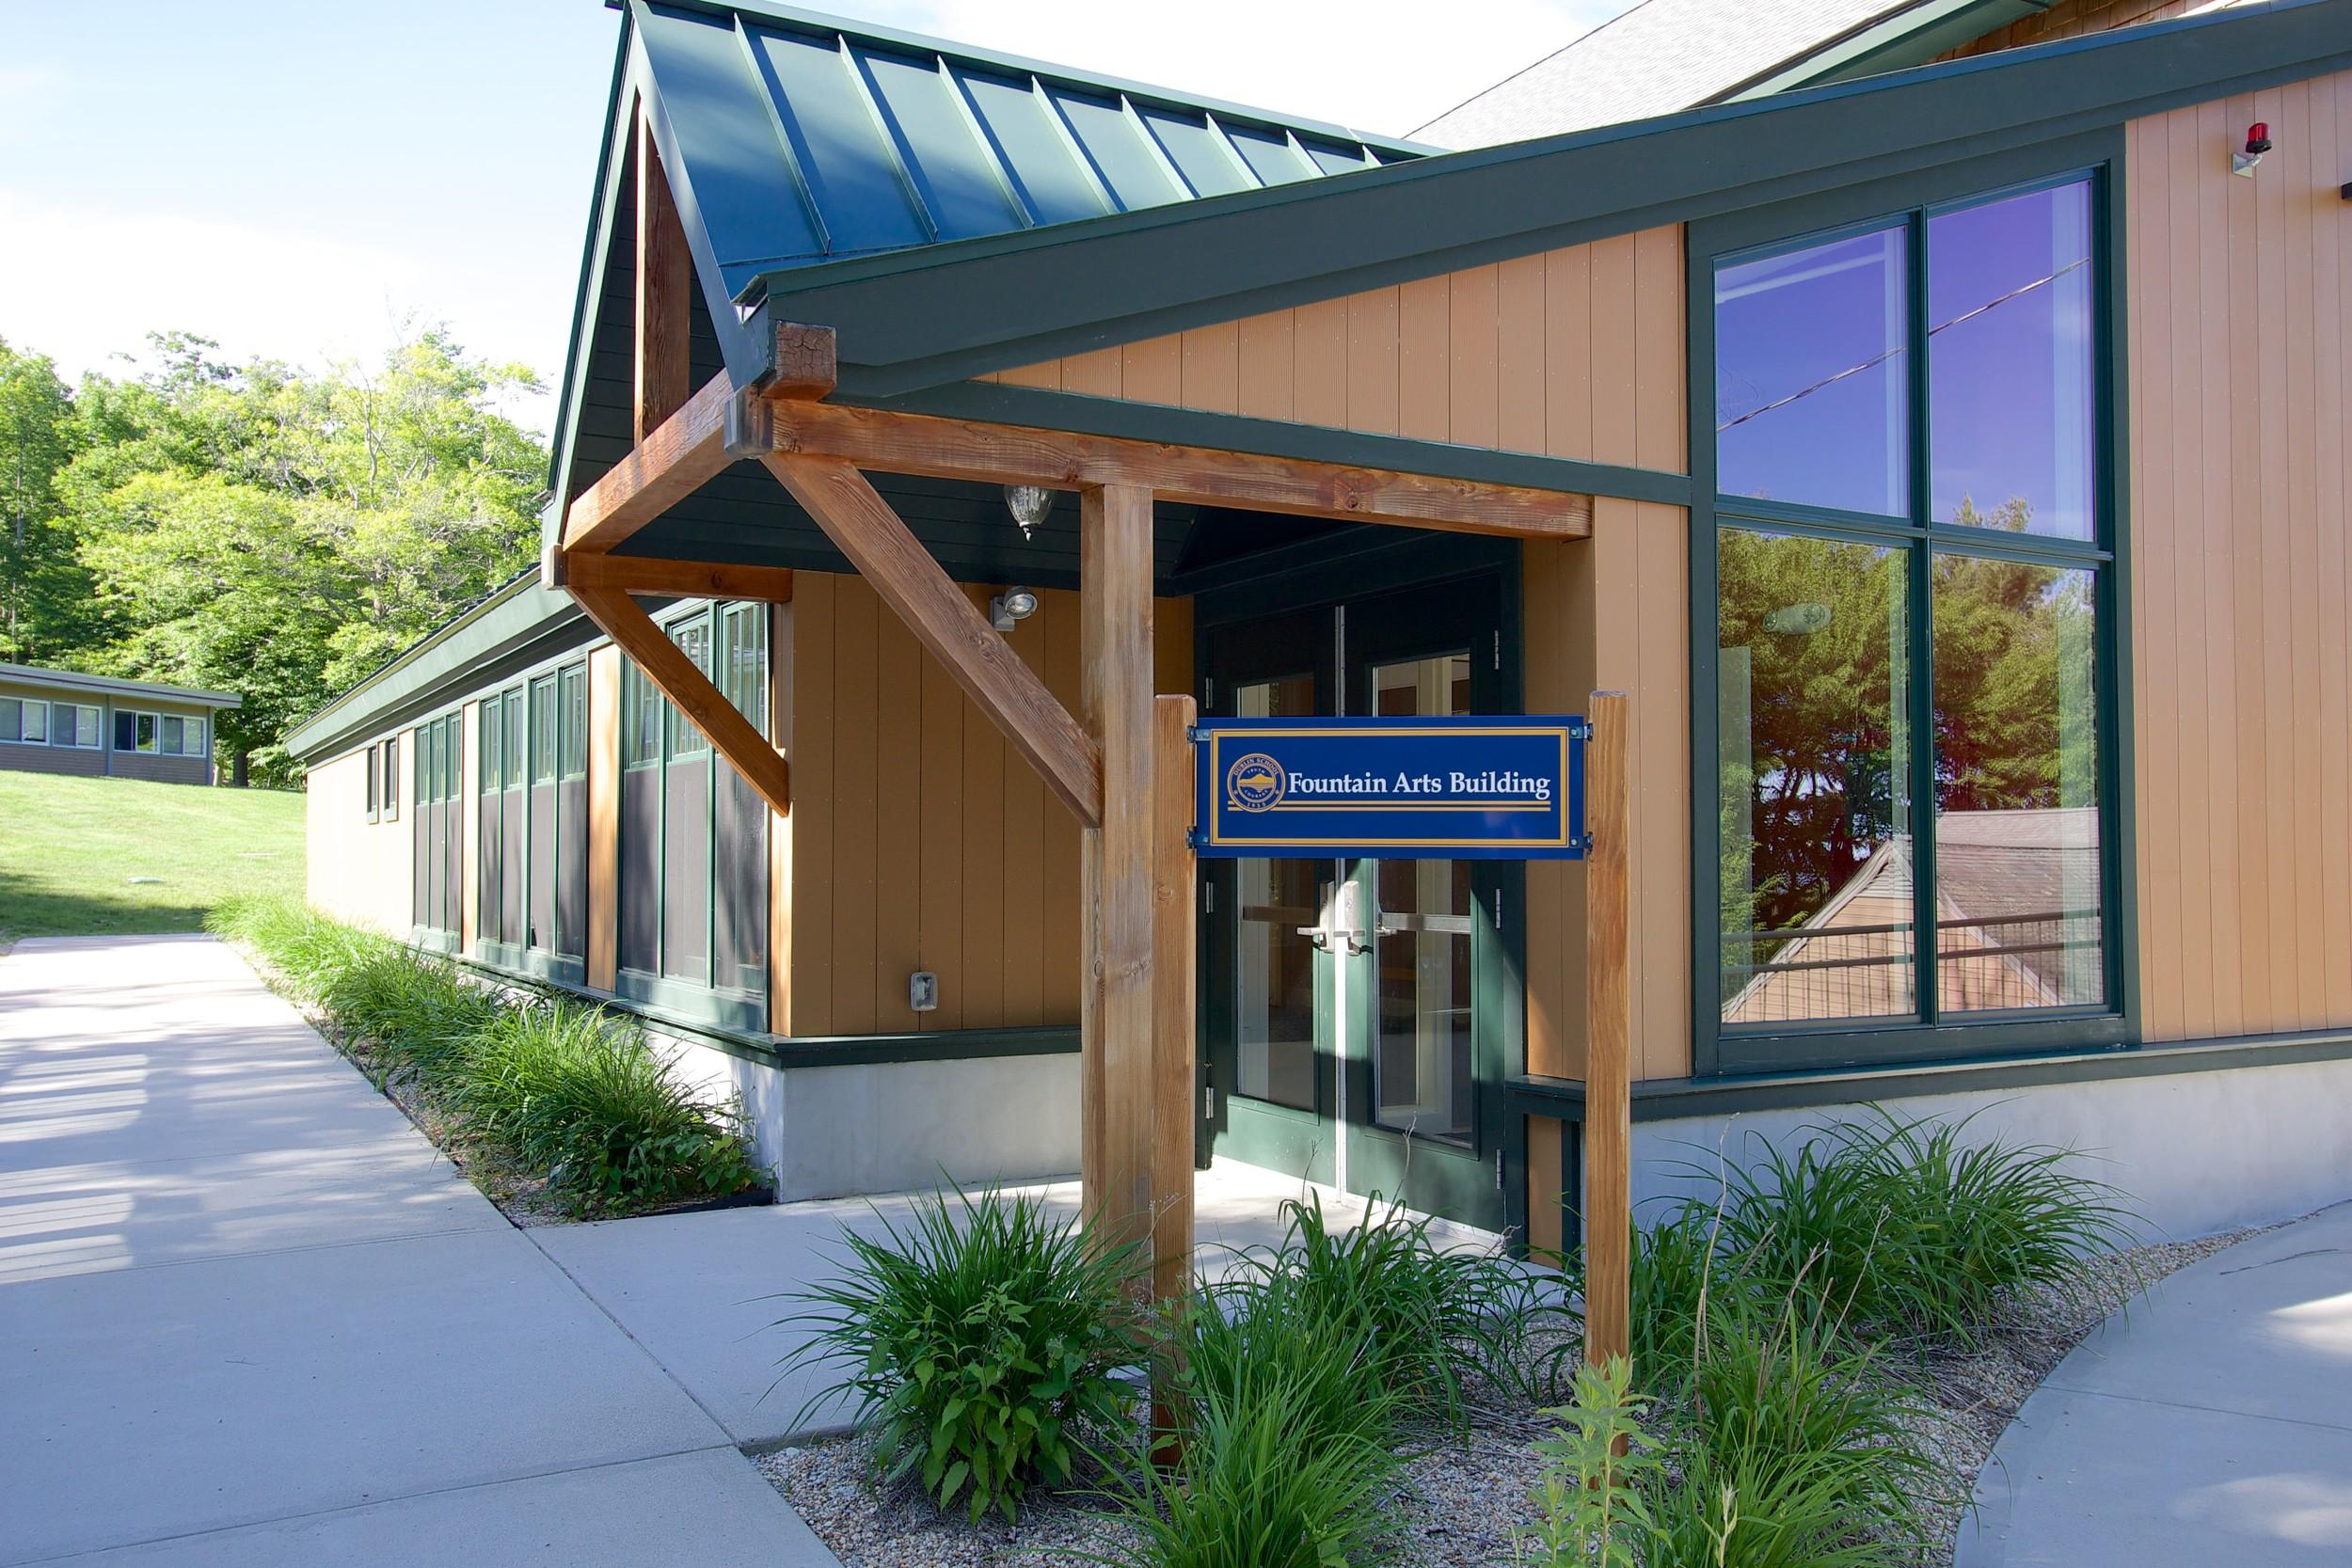 Fountain Arts Building